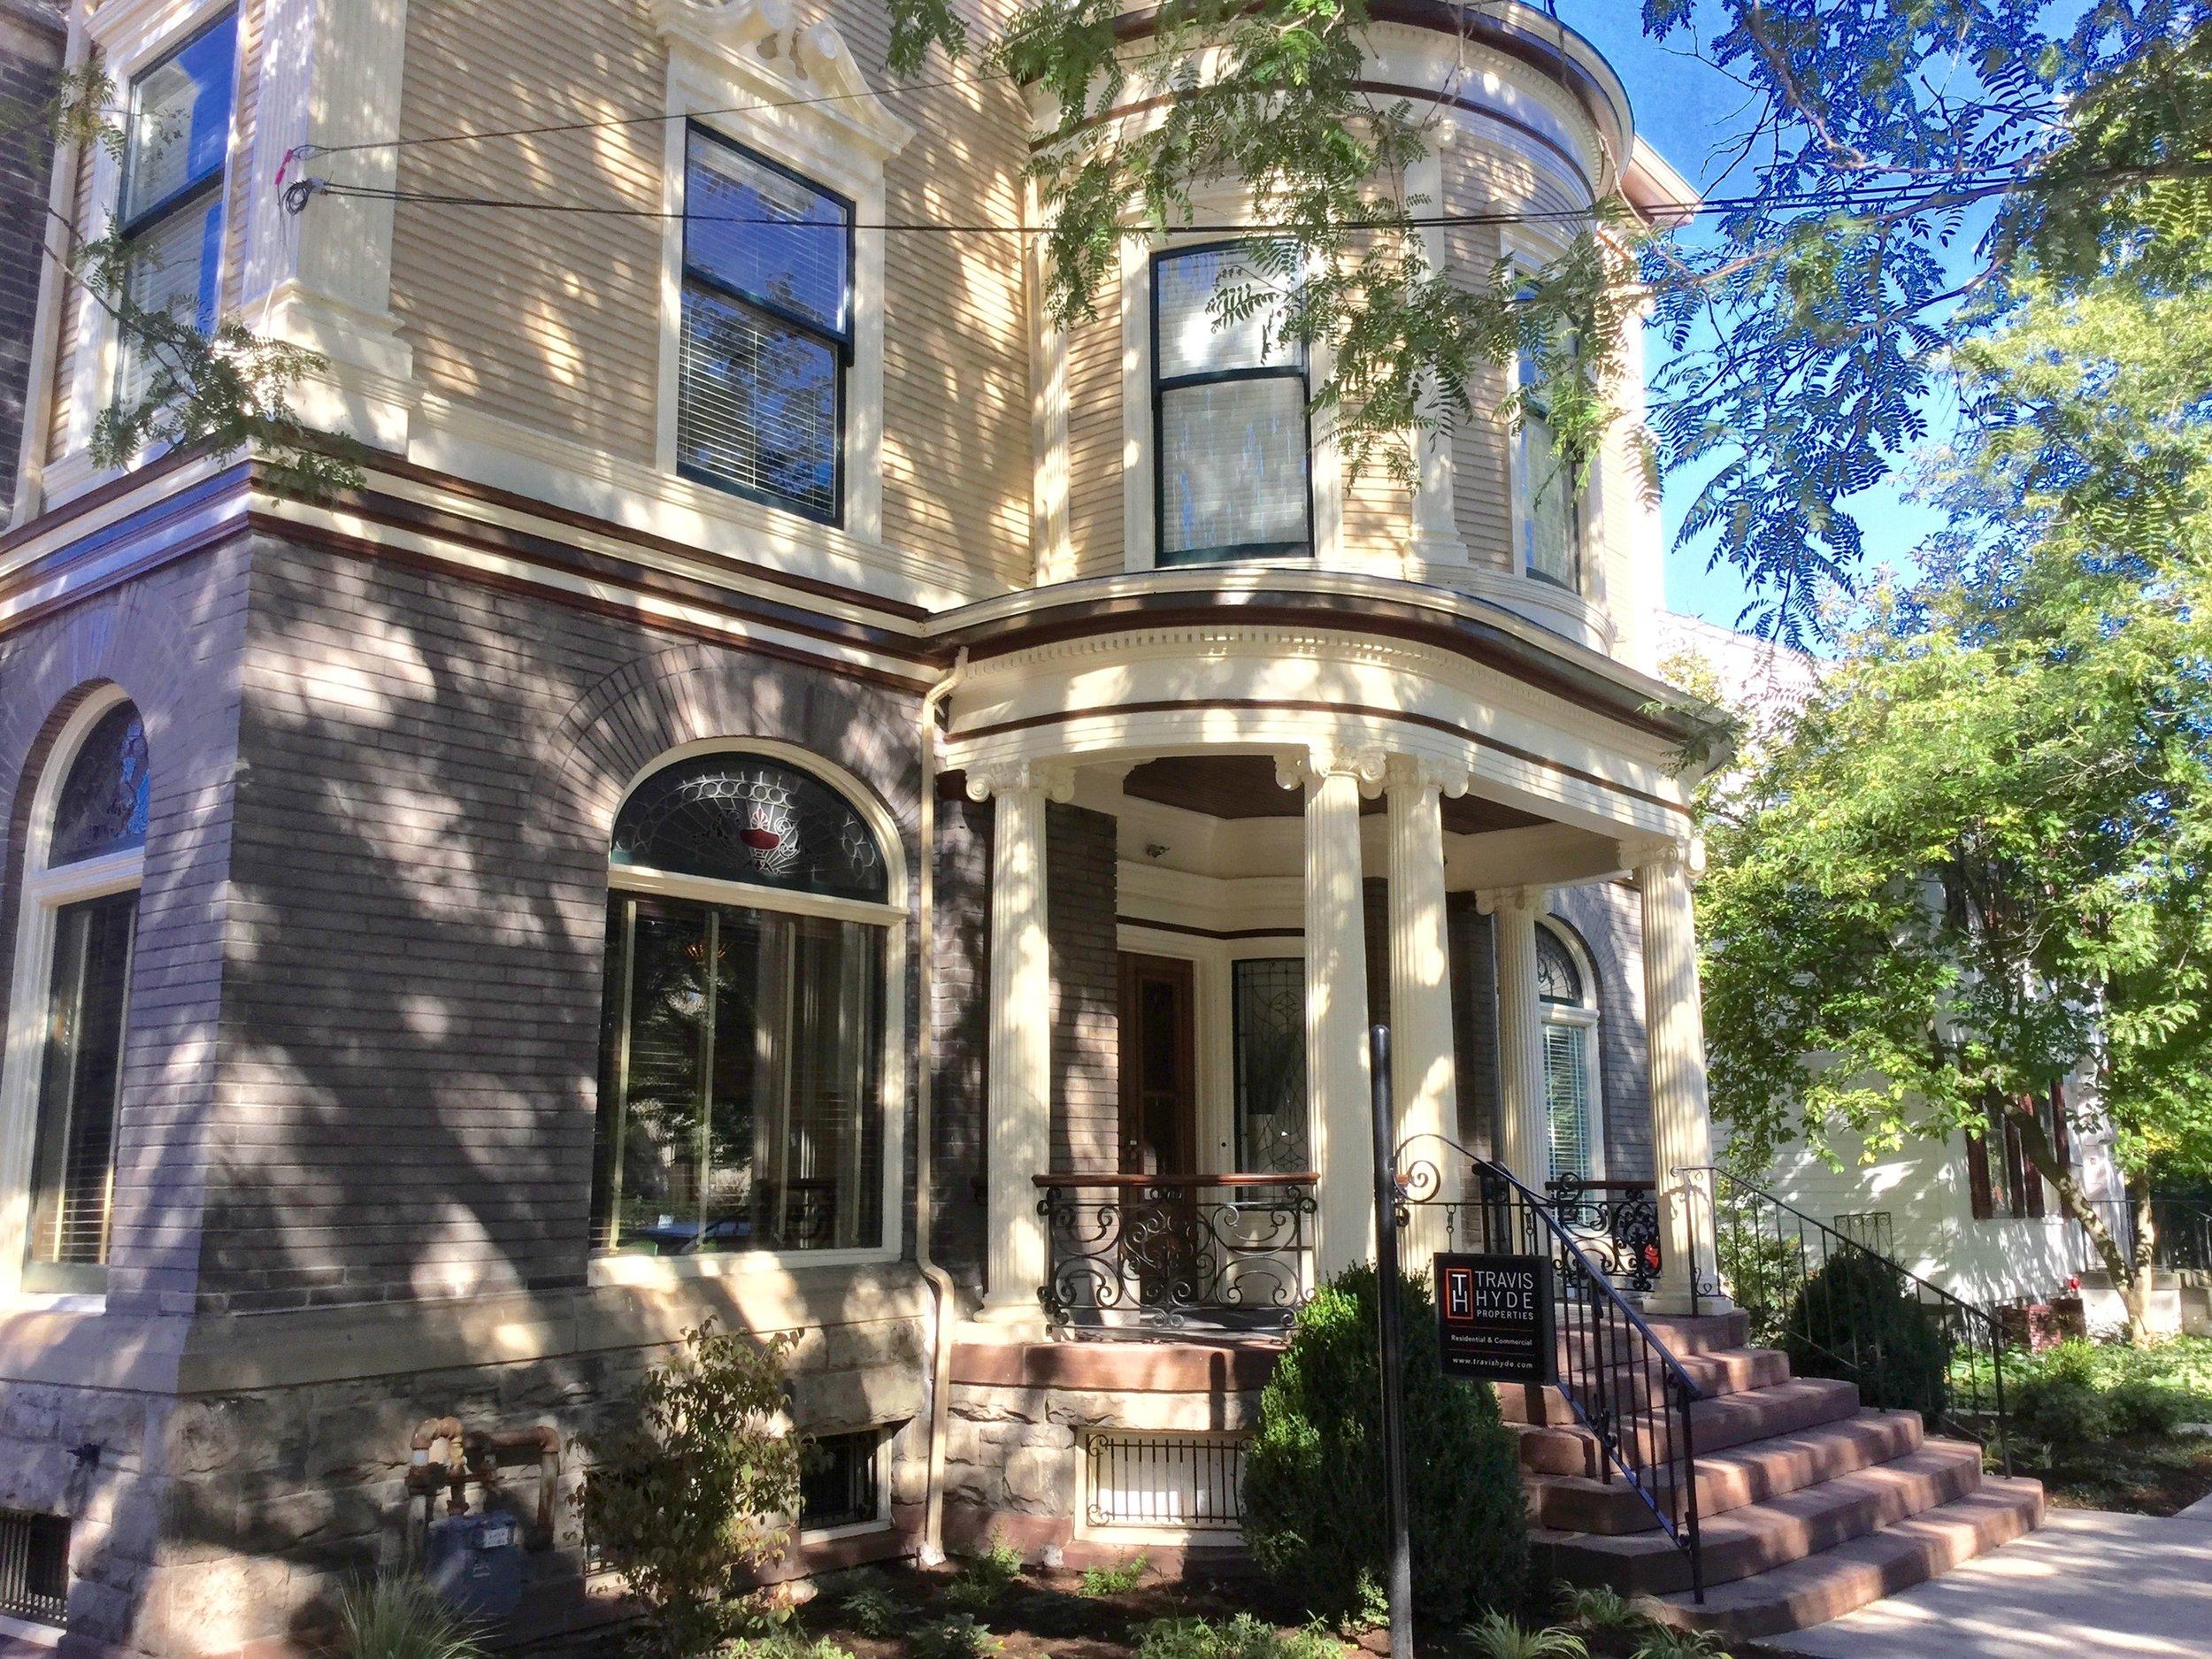 Travis Hyde PropertiesMain Office - 306 North Cayuga StreetP.O. Box 6531Ithaca, NY 14850Phone: 607.273.1654Fax: 607.273.5382Email: info@travishyde.com